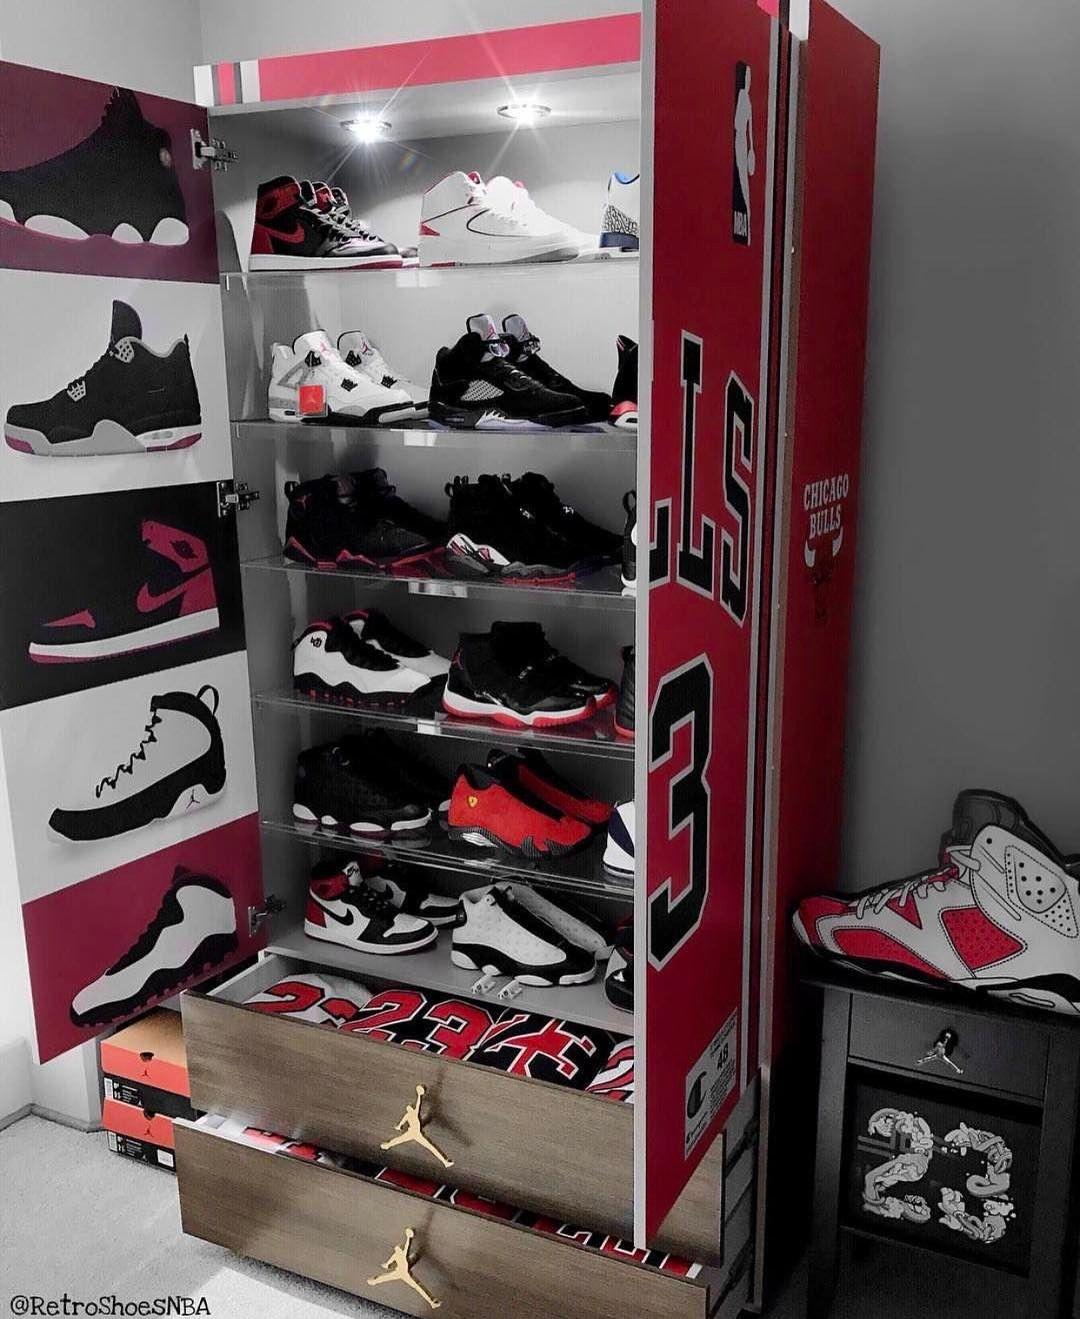 58f0e288e2a jordans12$39 on in 2019 | Product display | Custom jordans, Sneaker ...